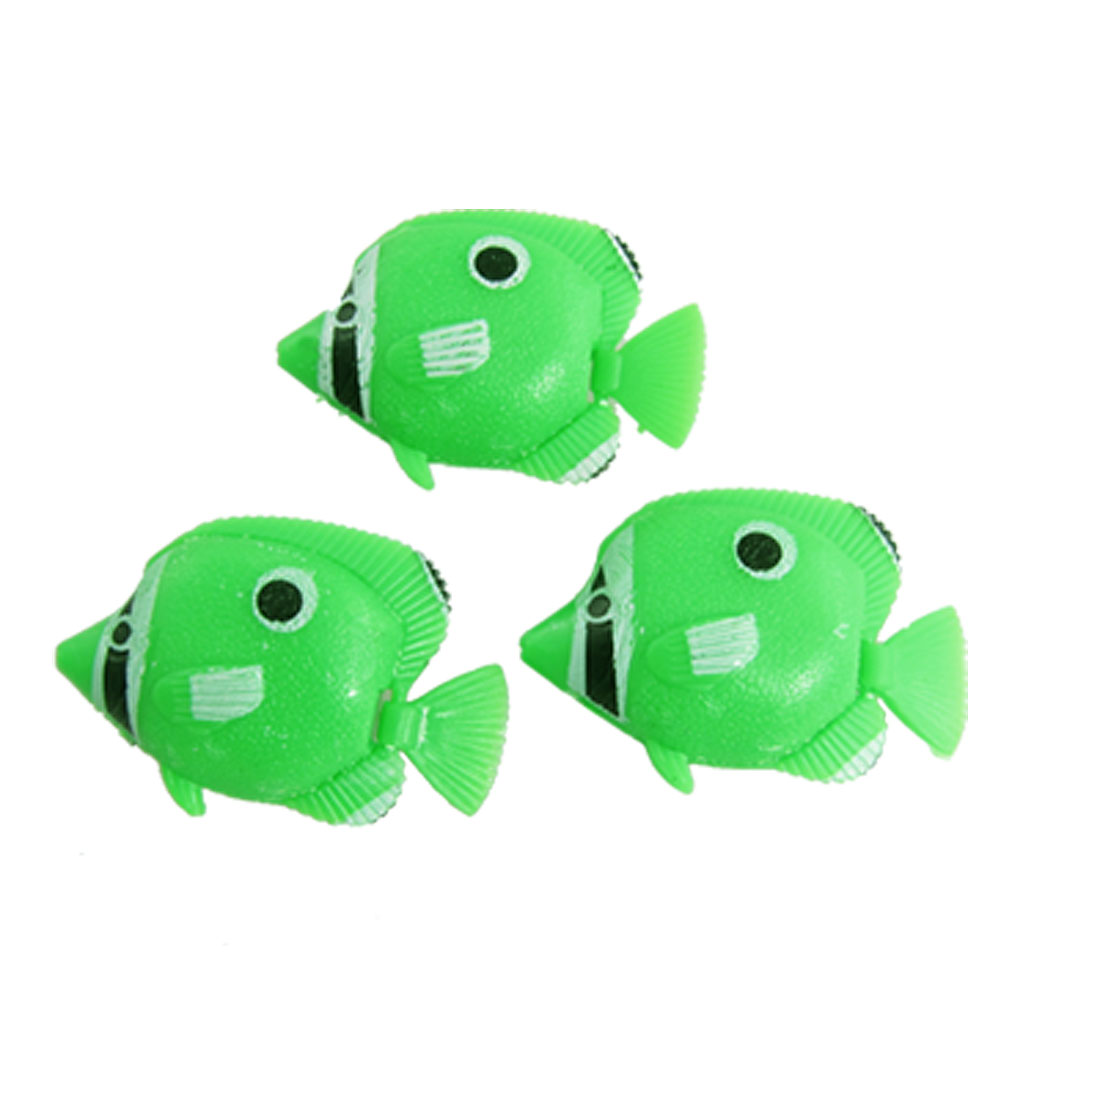 Floating Tail Green Plastic 3 Pcs Tropical Fish Aquarium